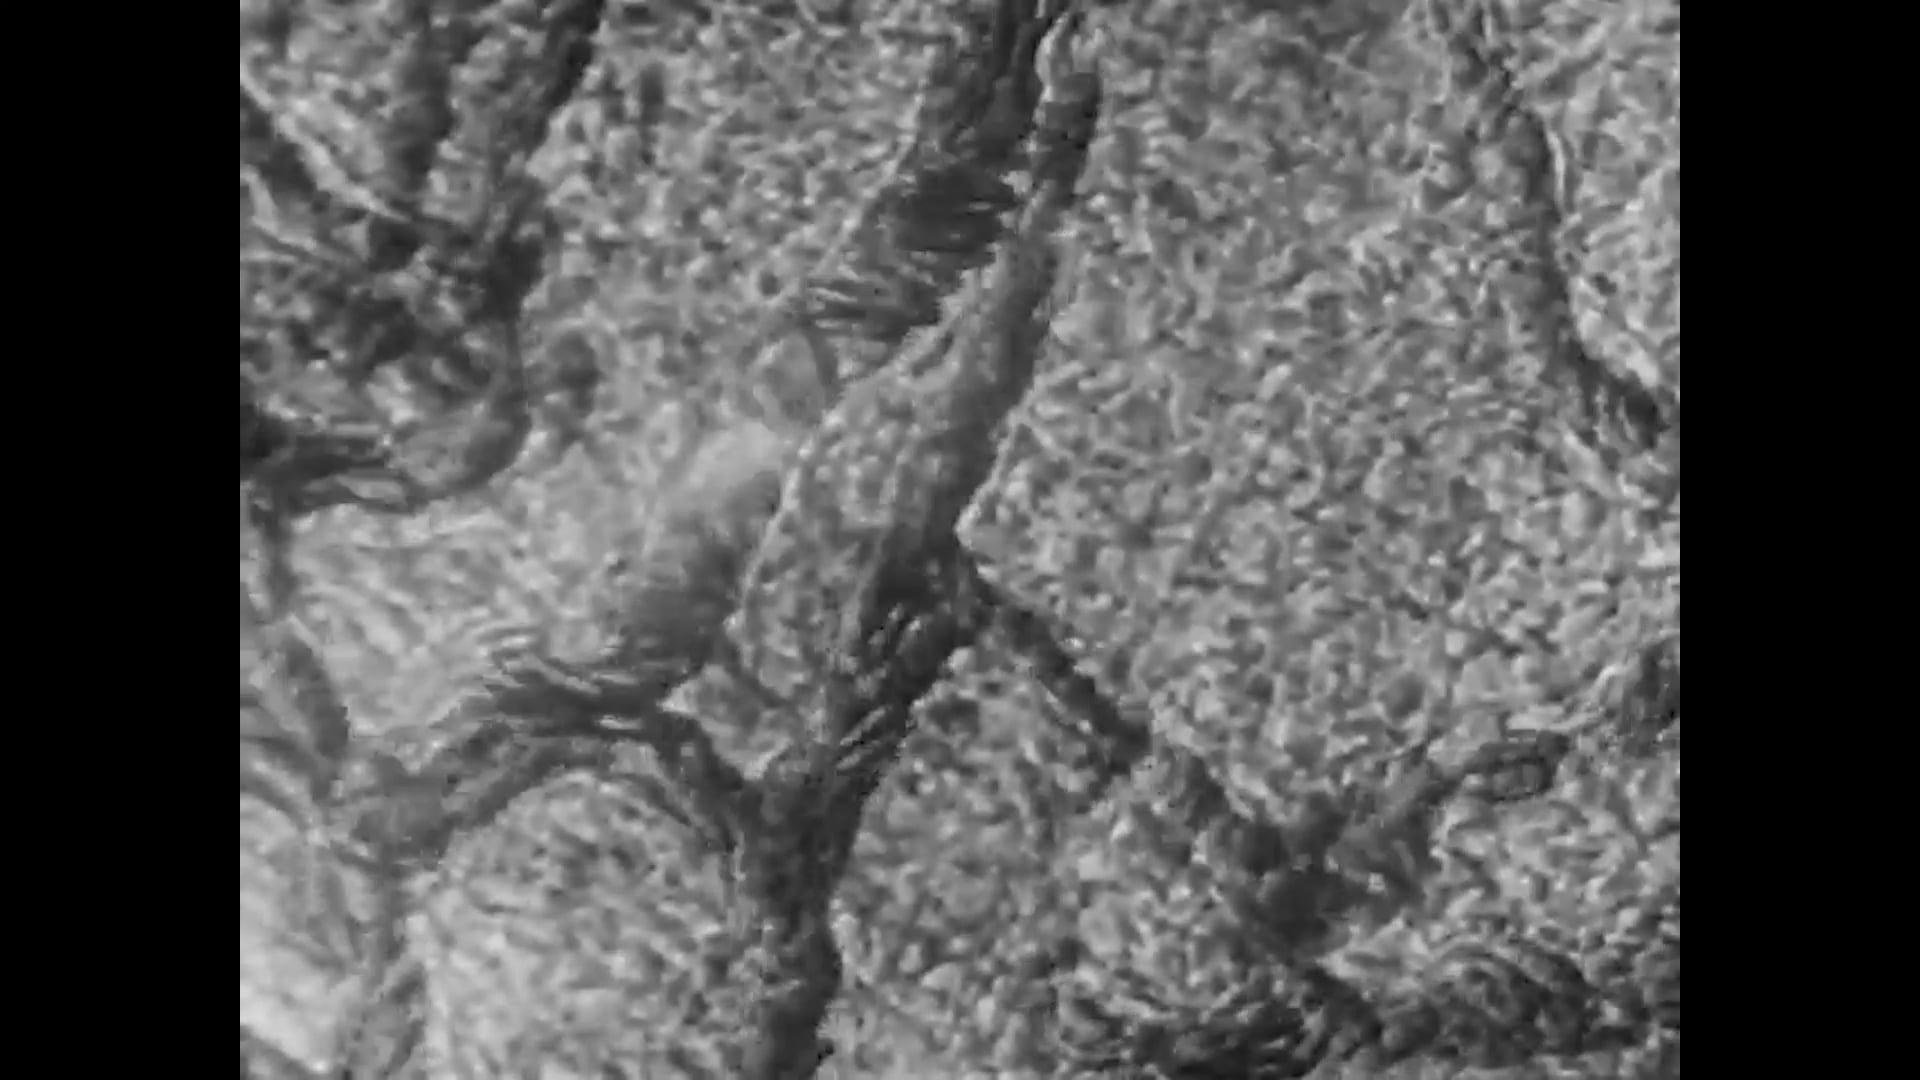 Paul Vinsonhaler - Fermi Paradox (Music Video)